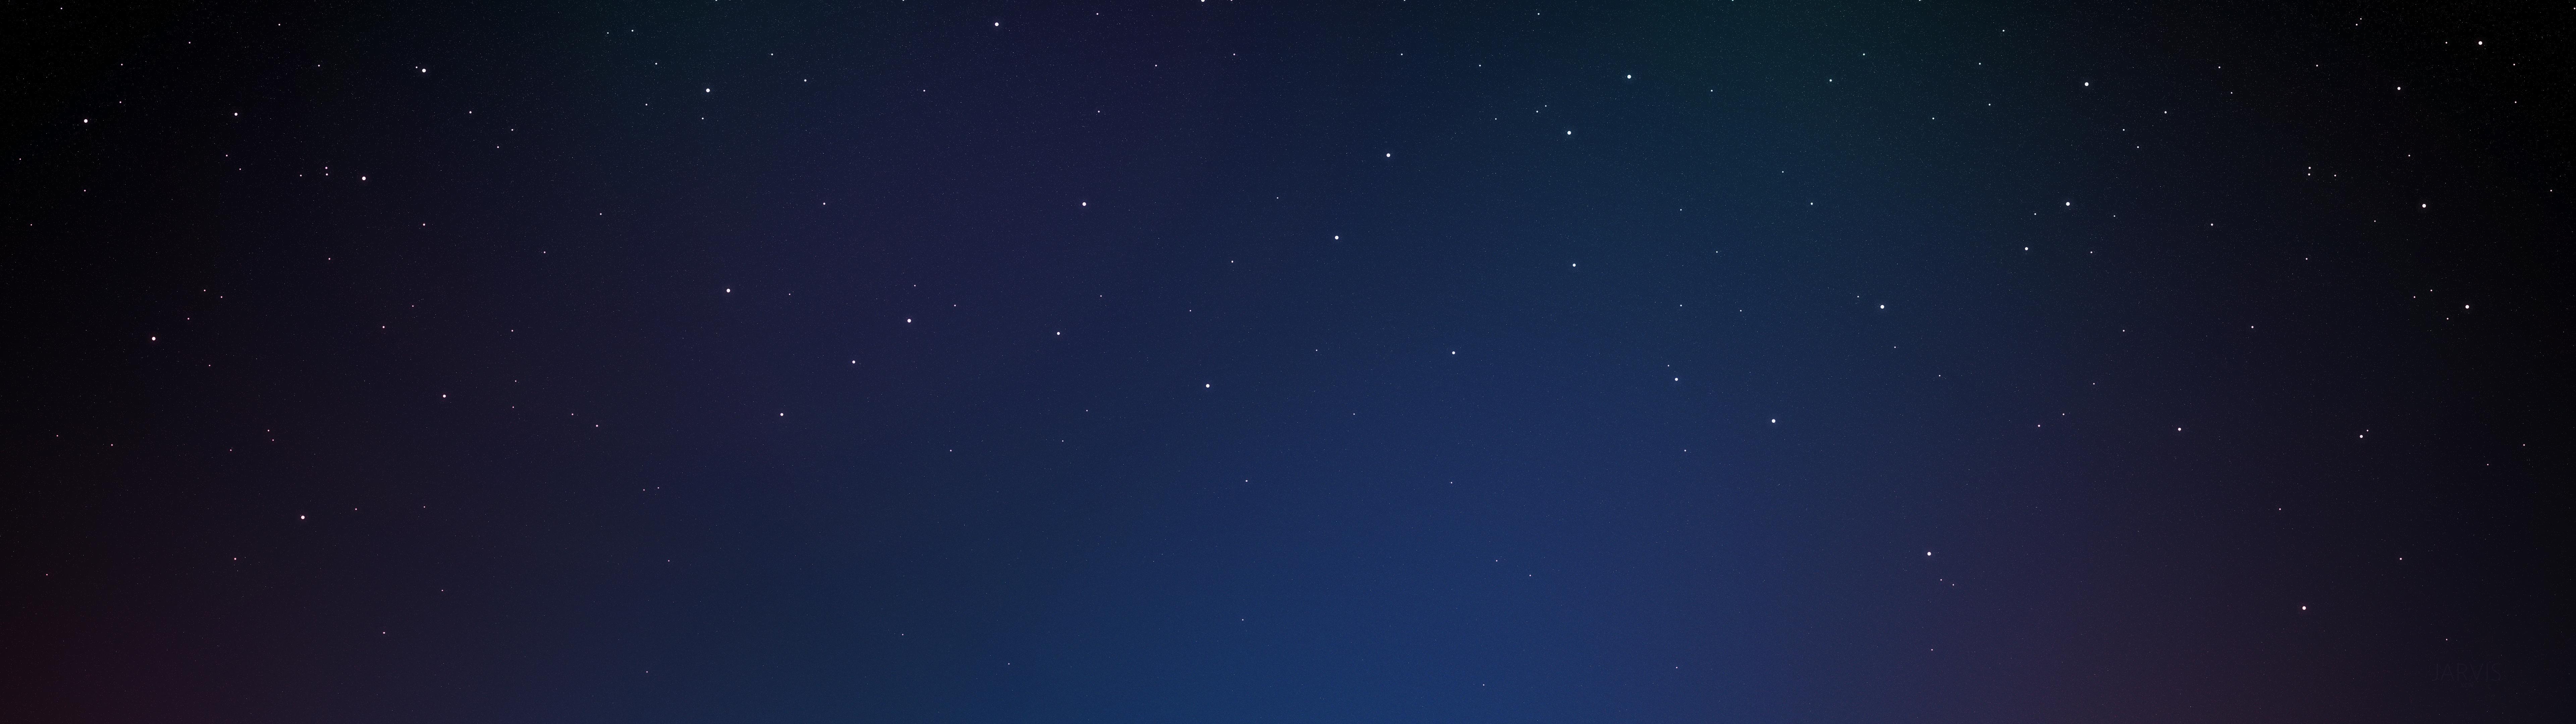 stars fields 1574943092 - Stars Fields -